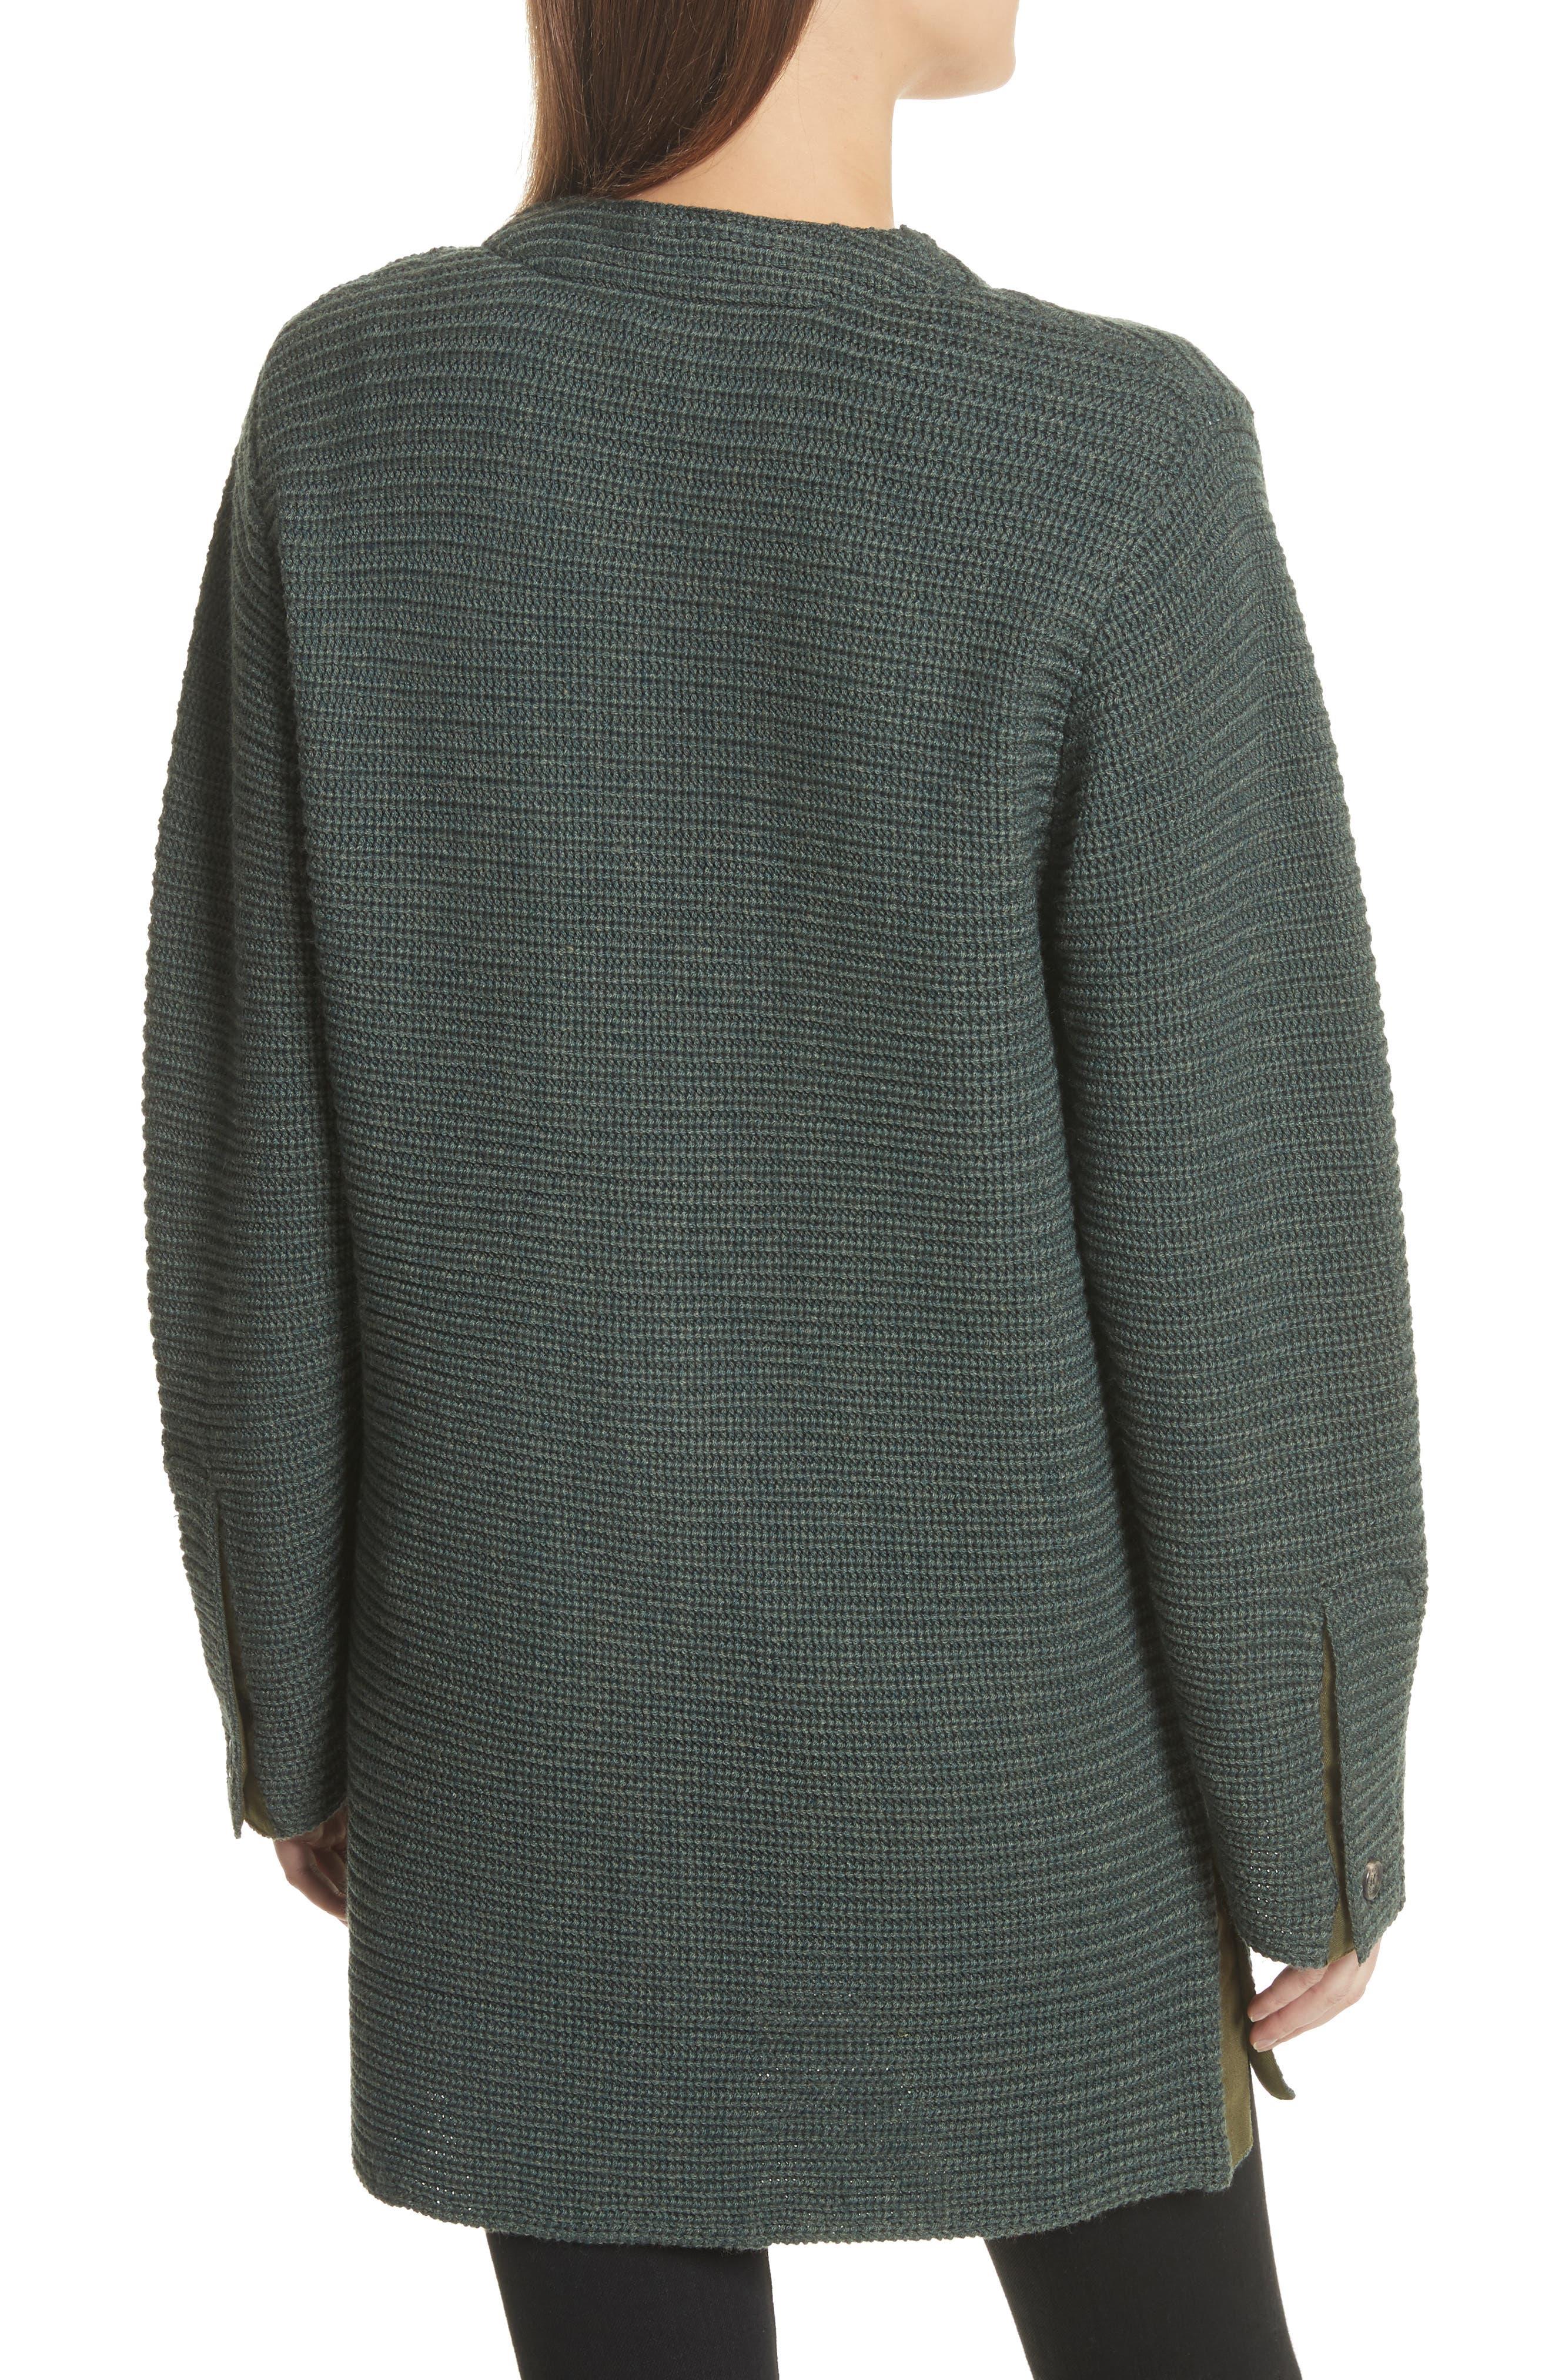 Fleta Merino Wool Blend Cardigan,                             Alternate thumbnail 2, color,                             300